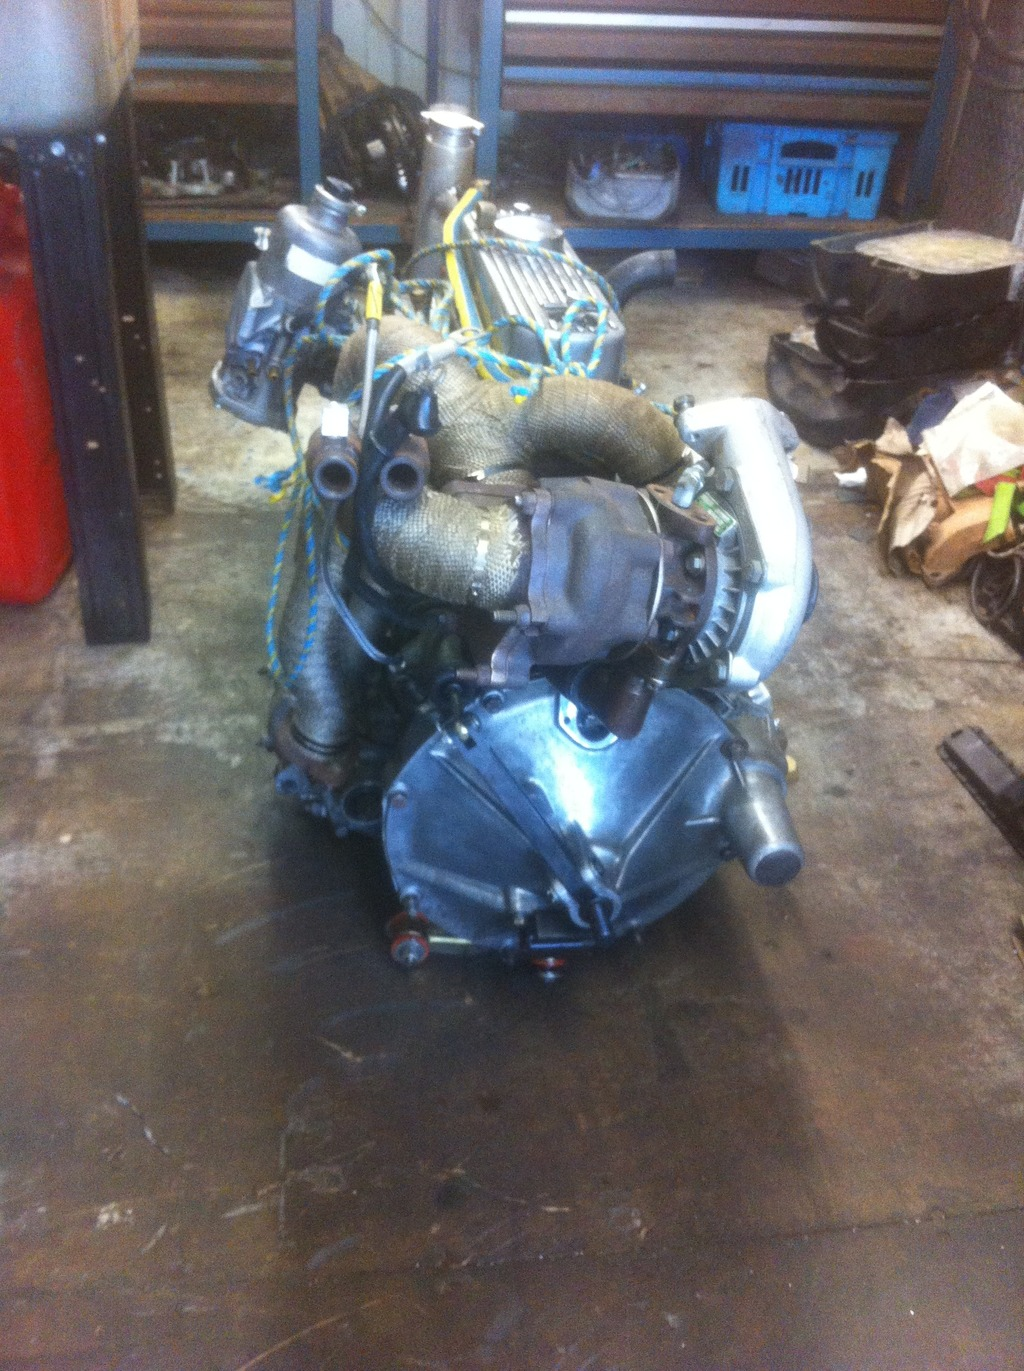 Josh's Turbo 1098cc IMG_1071_zpsamt7wn5d